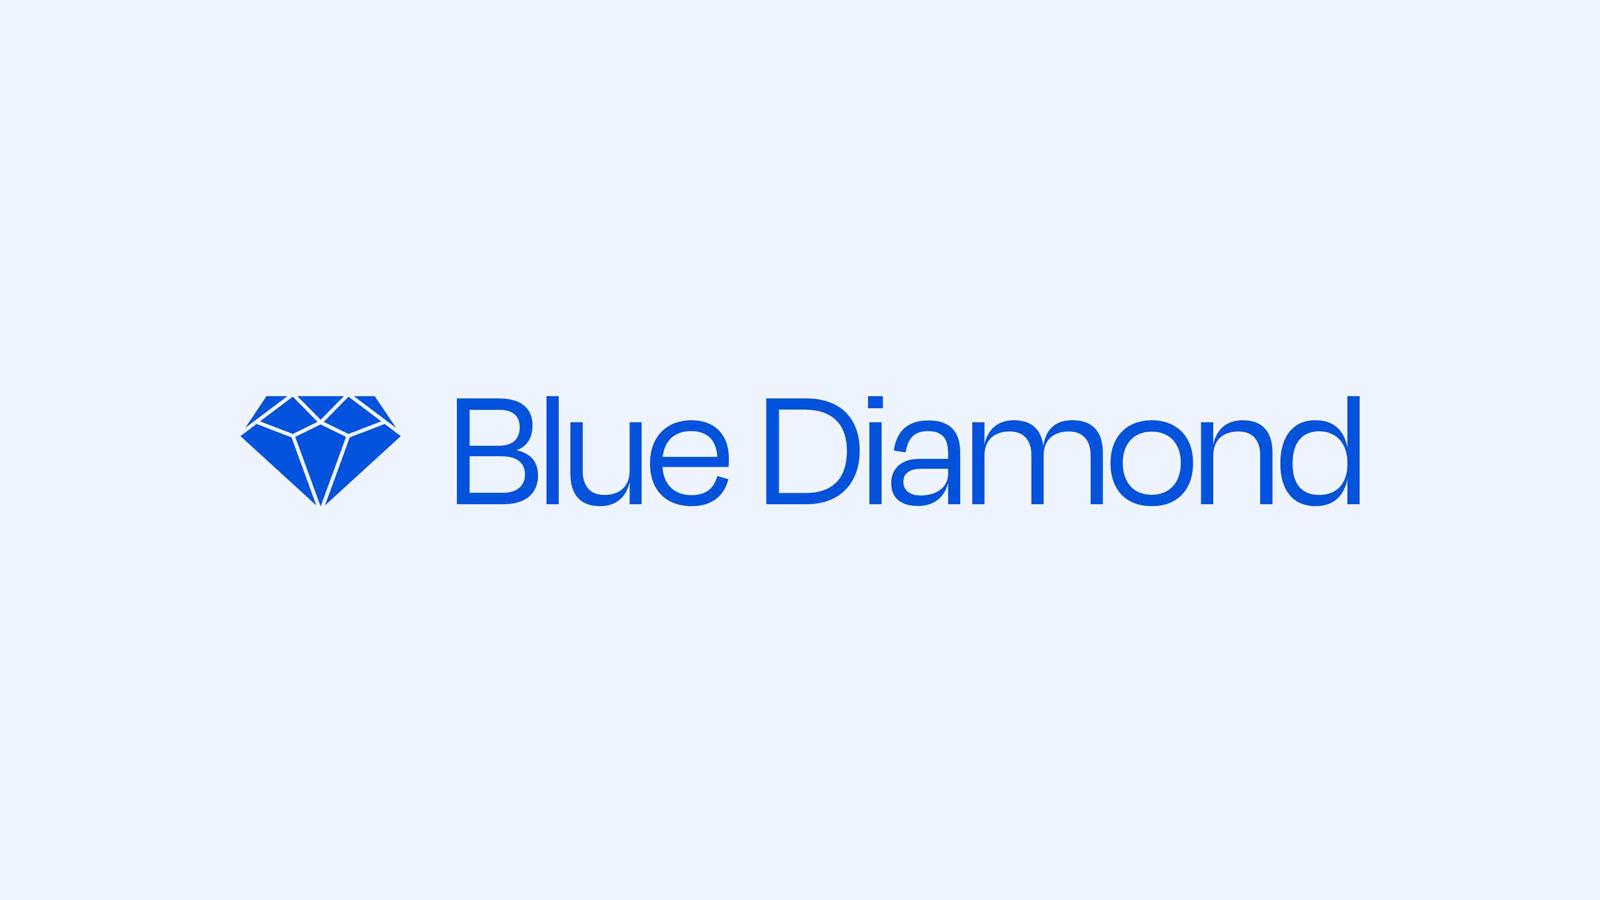 Blue Diamond blue logo lockup